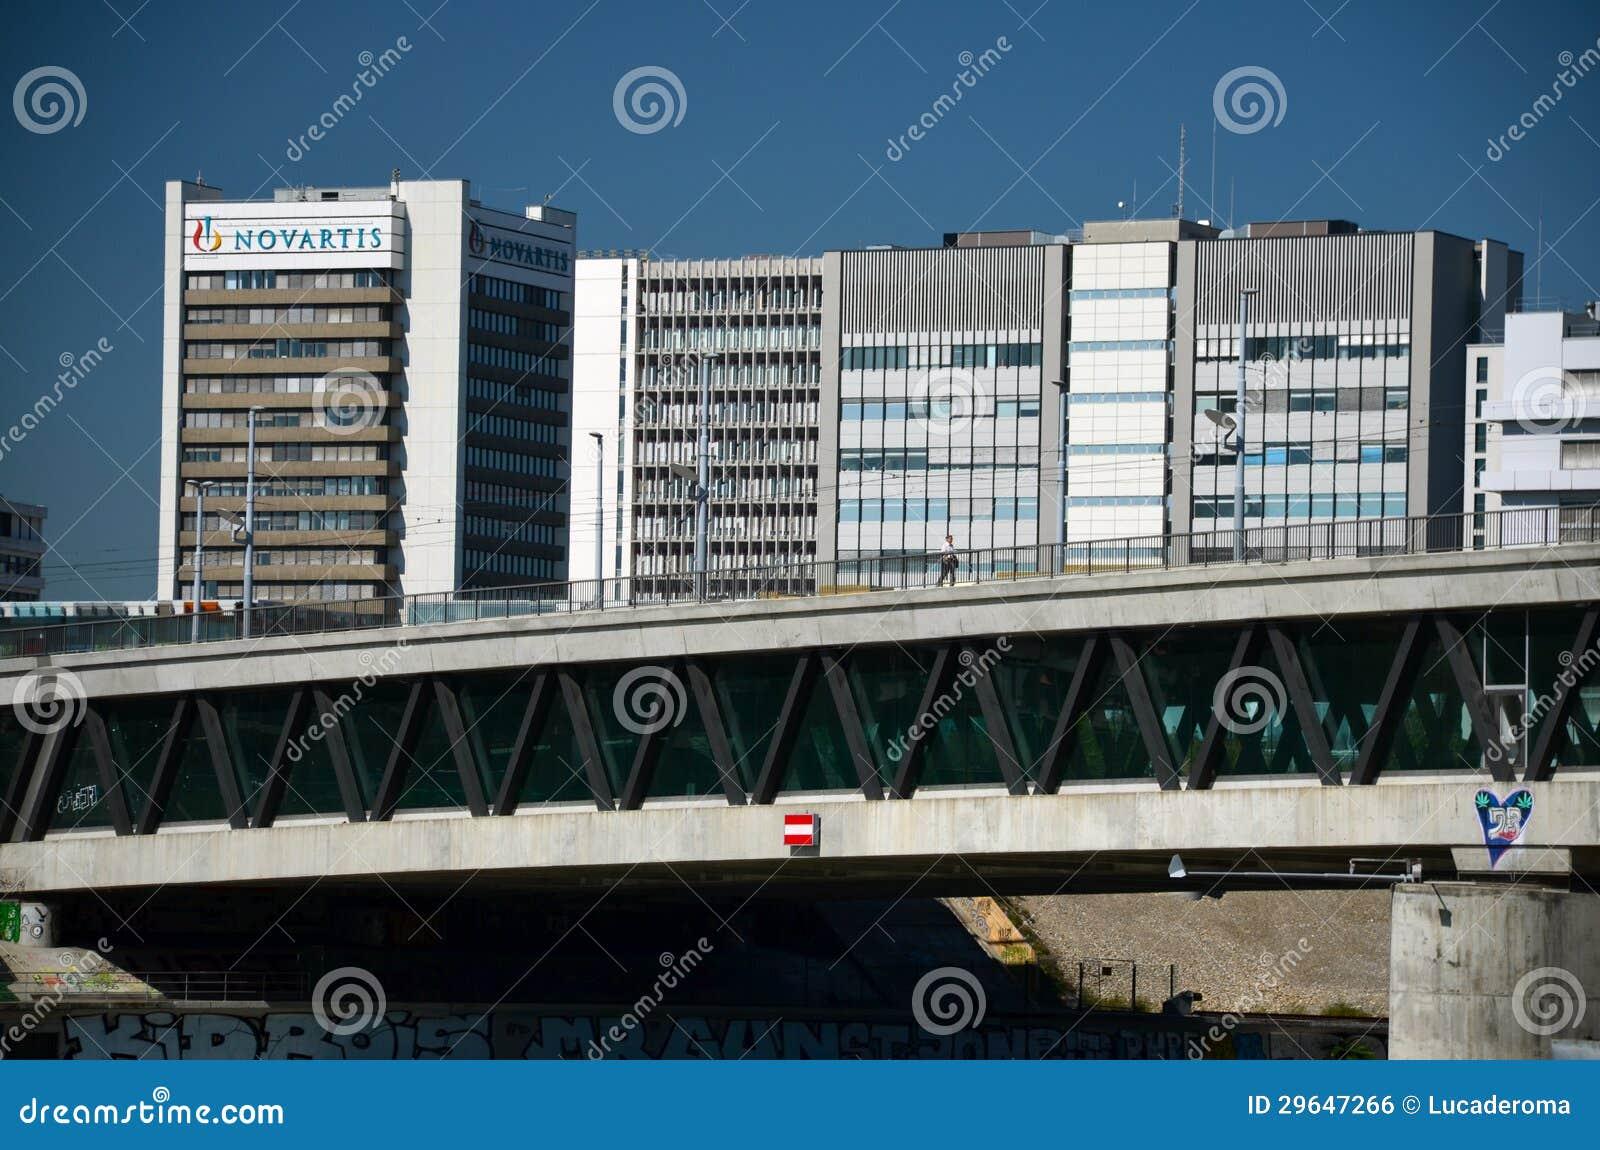 novartis international ag Novartis novartis international ag ch-4002 basel switzerland  ranked by ims health as one of the fastest-growing global pharmaceutical companies worldwide in recent.